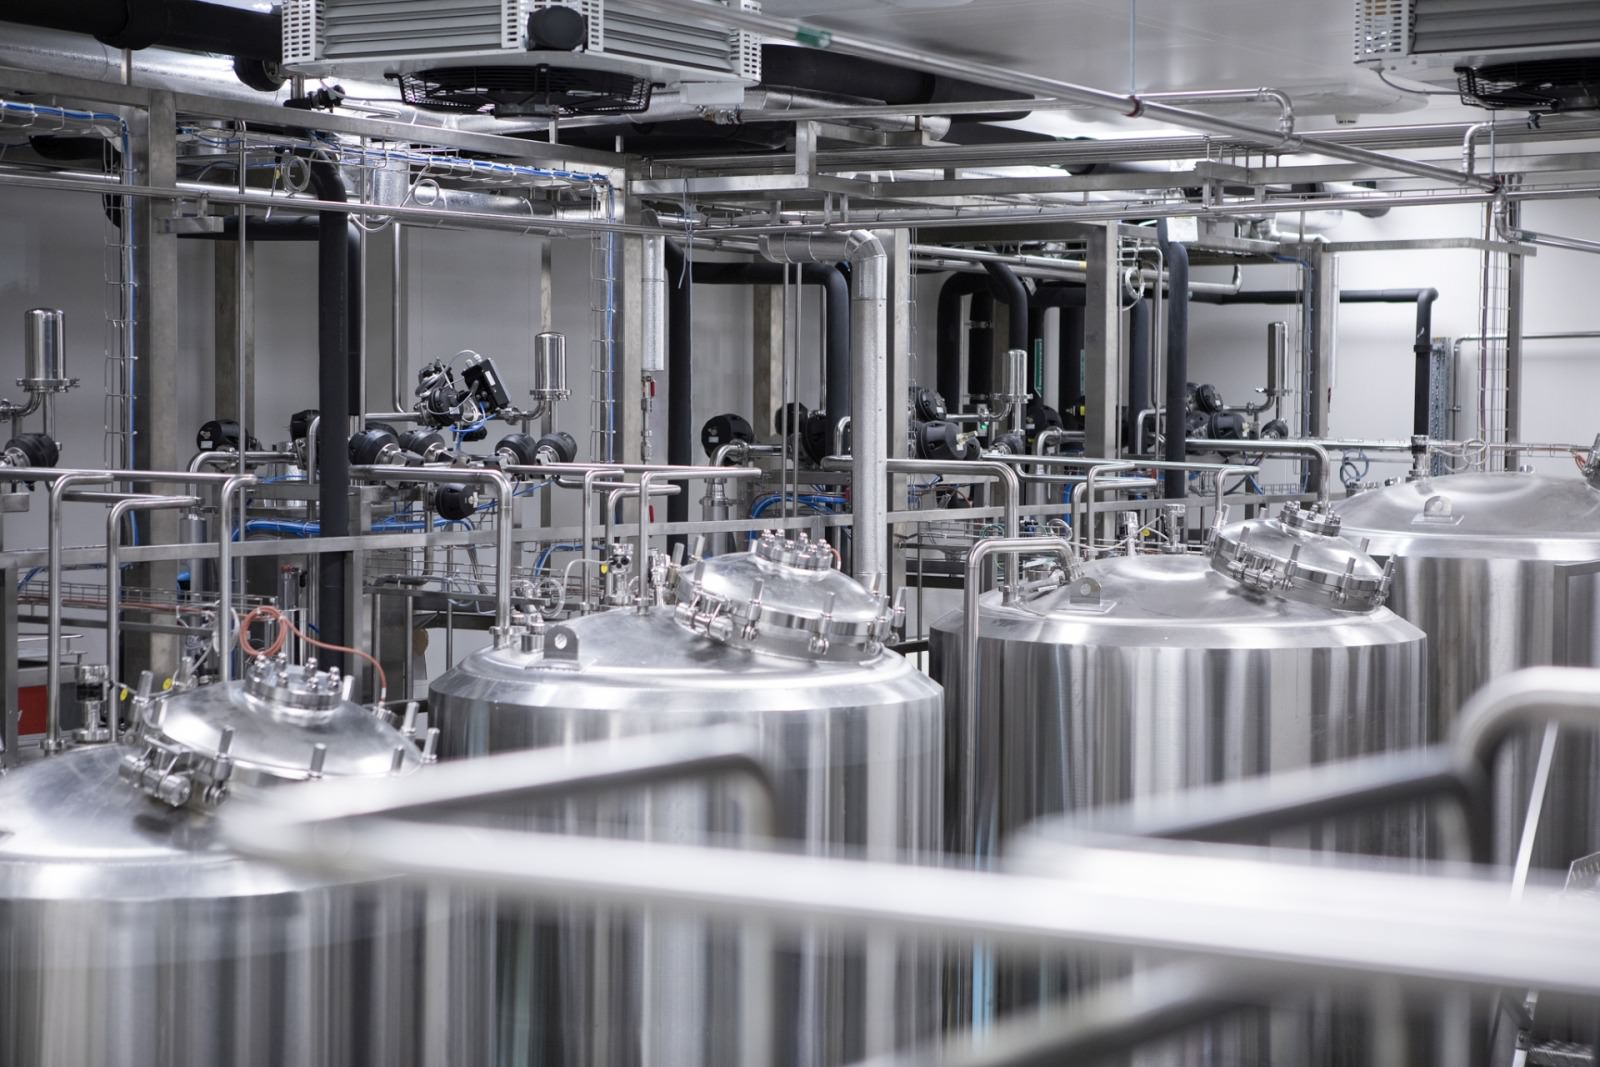 photo storage tanks buffer for immunglobulin